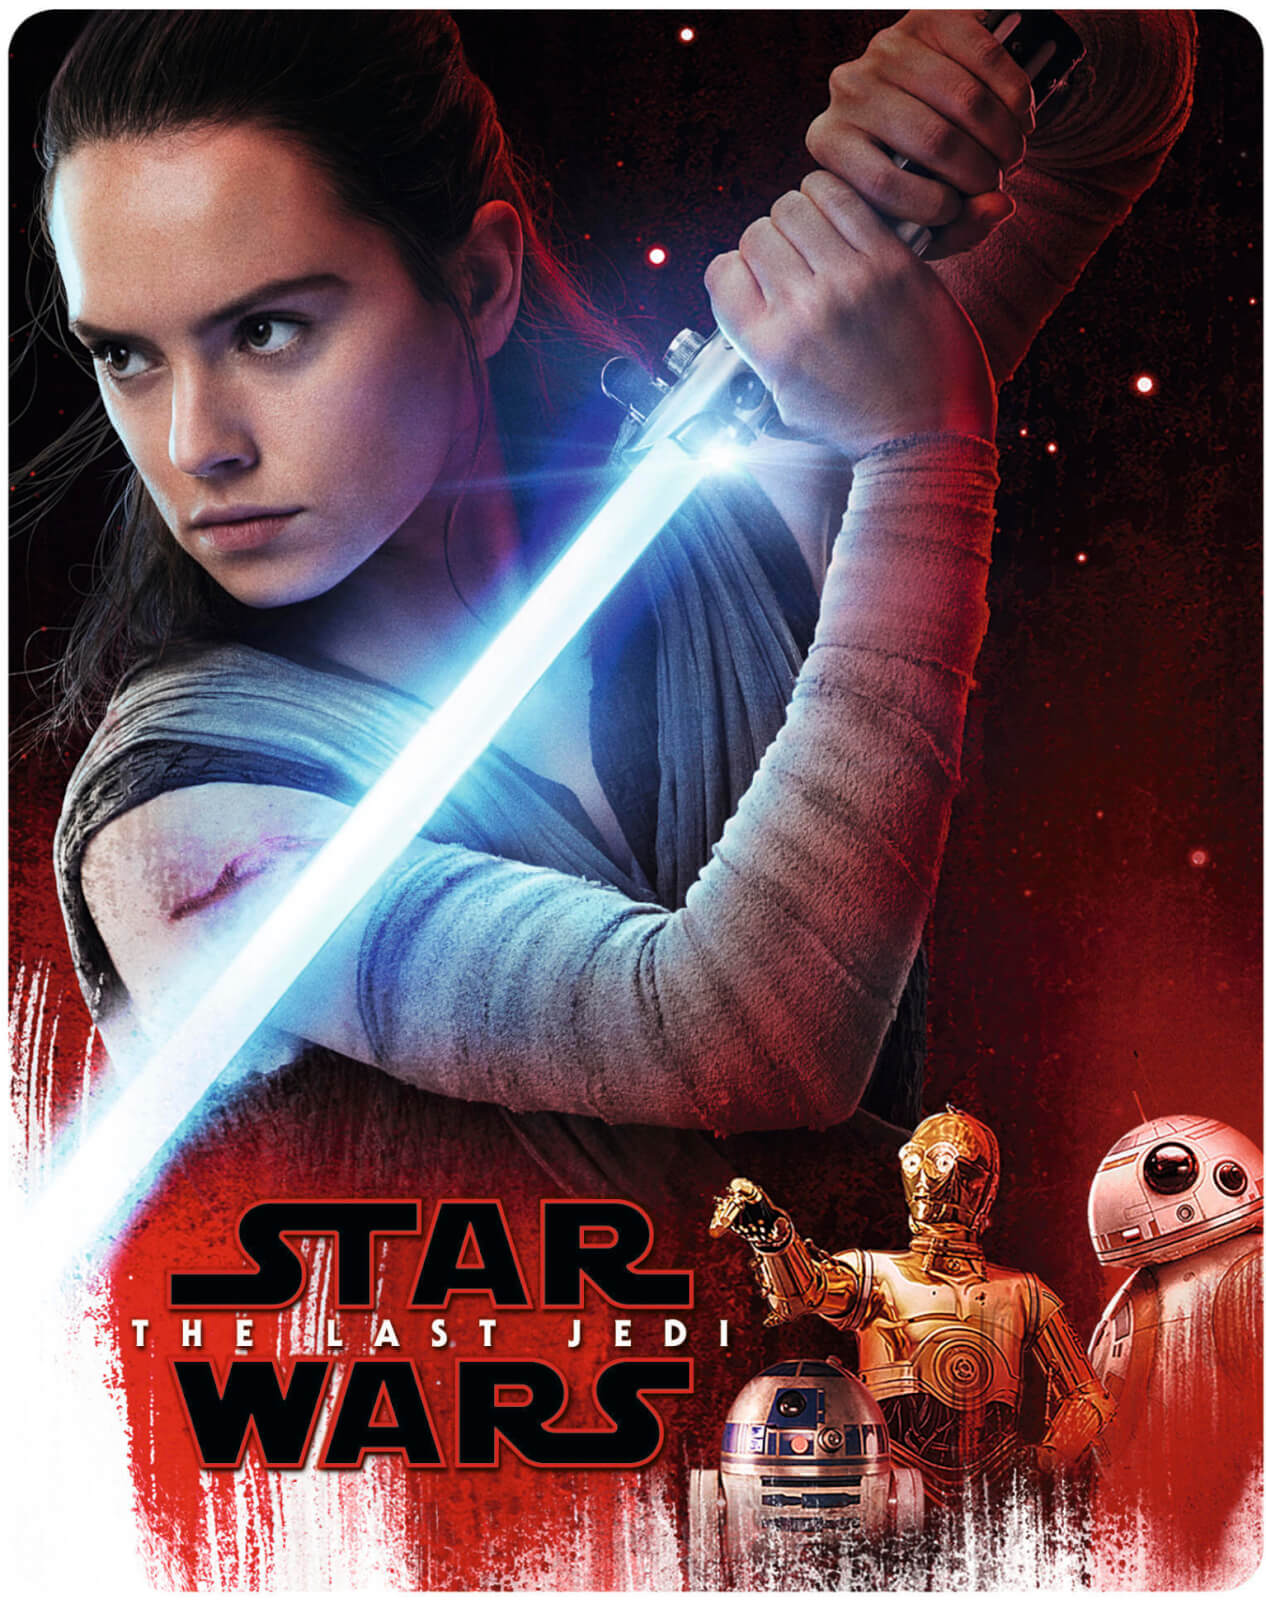 vavvi.com|pimpandhost.com 4 Star Wars: The Last Jedi 3D (Includes 2D Version) - Zavvi Exclusive Limited